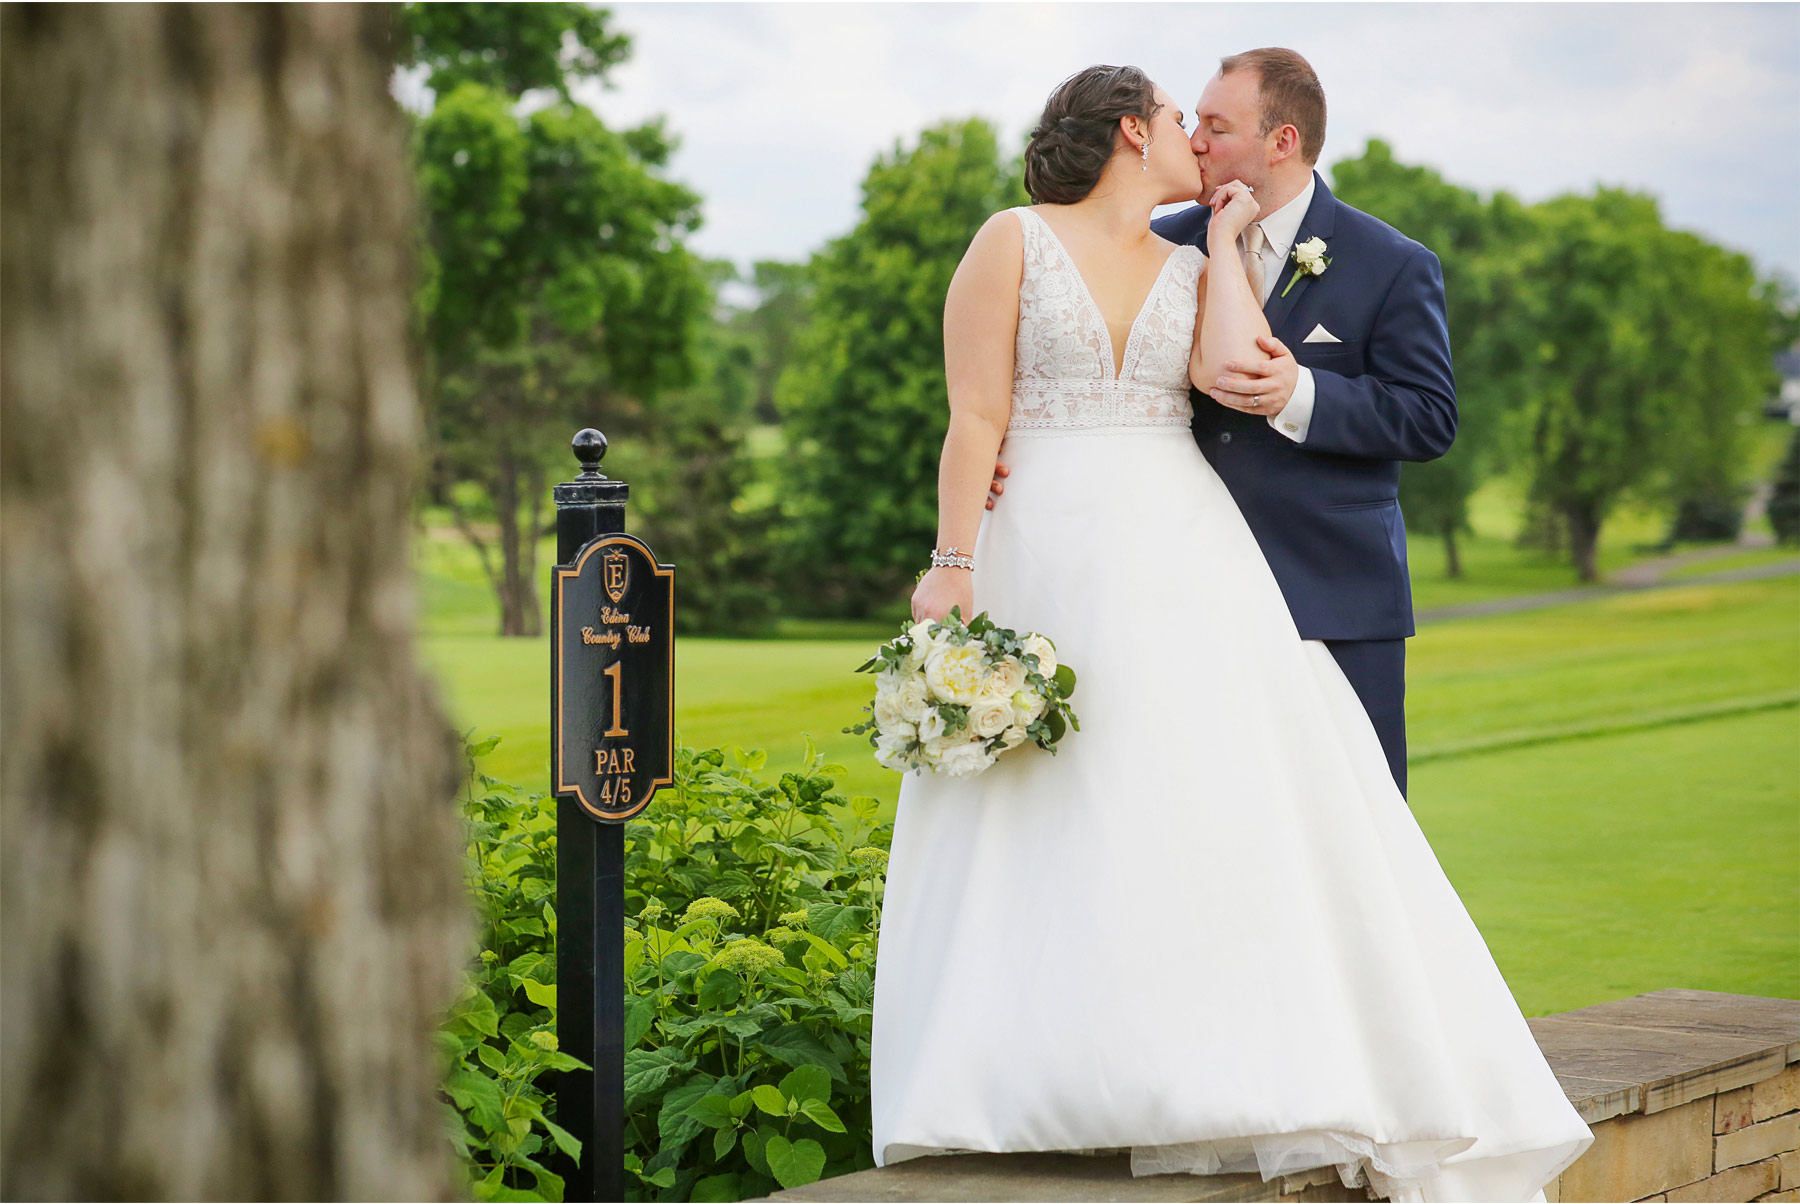 16-Vick-Photography-Wedding-Minneapolis-Minnesota-Edina-Country-Club-Reception-Bride-Groom-Erin-and-David.jpg